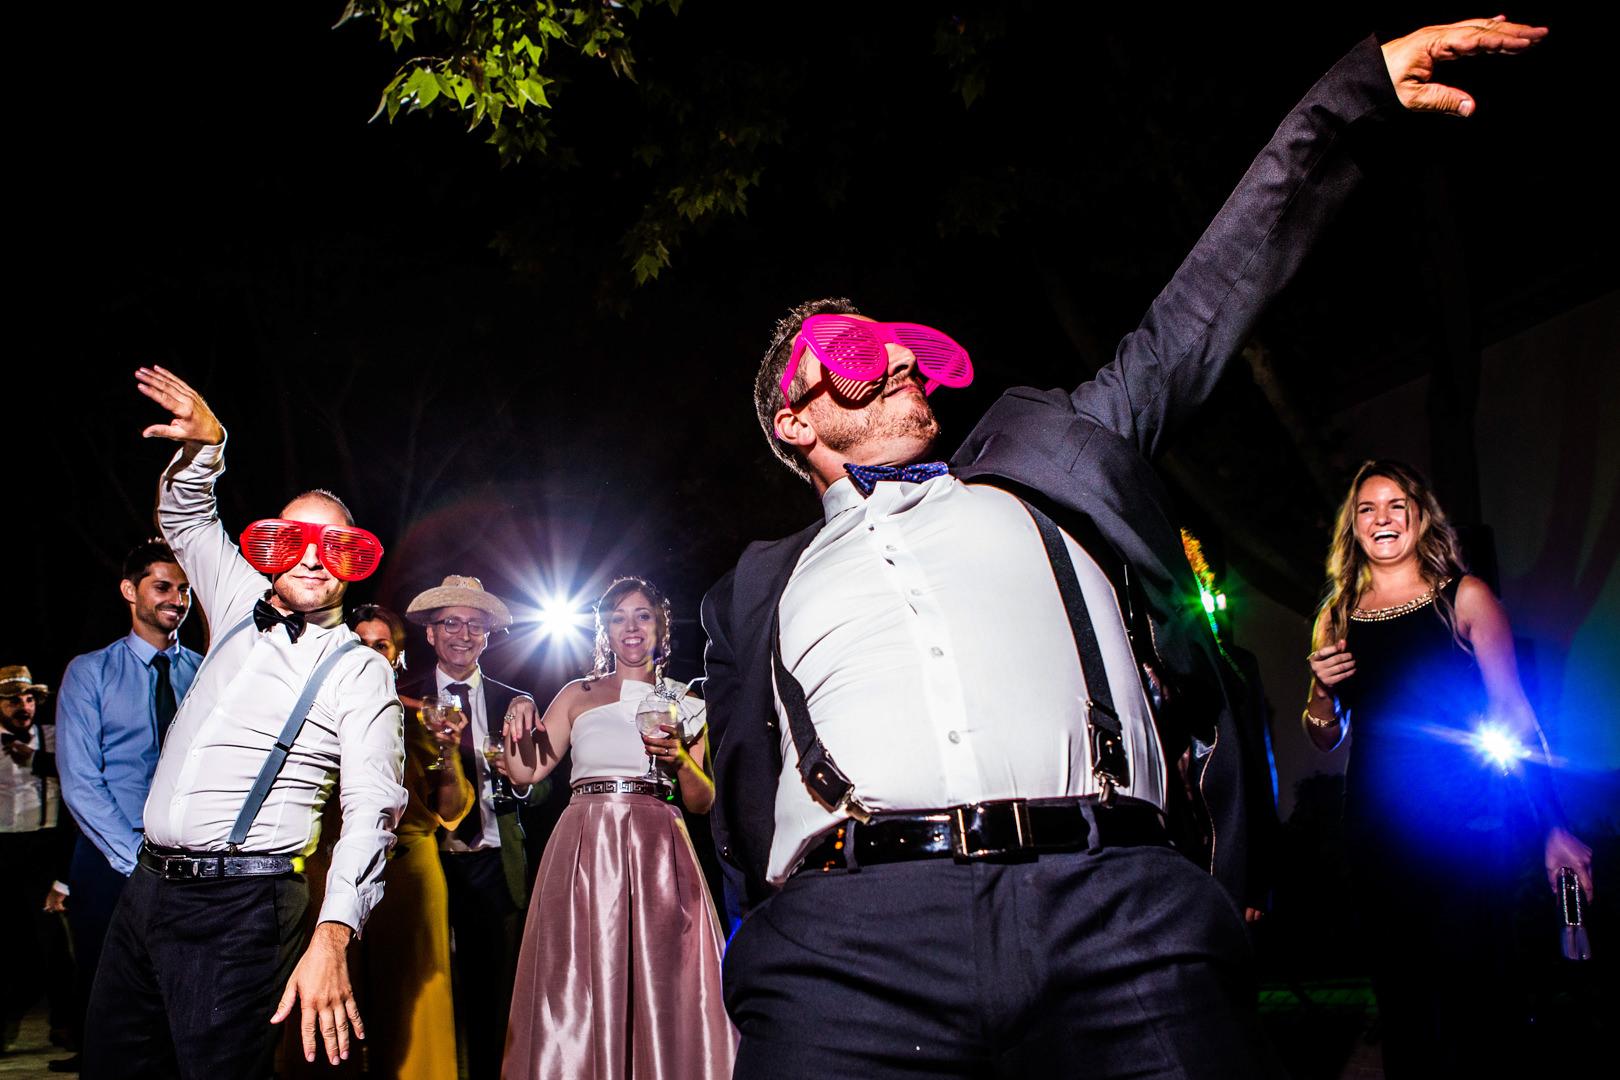 Boda-Irene-Marcos-Dos-Hermanas-Finca-Clotidle-engagement-Rafael-Torres-fotografo-bodas-sevilla-madrid-barcelona-wedding-photographer--40.jpg